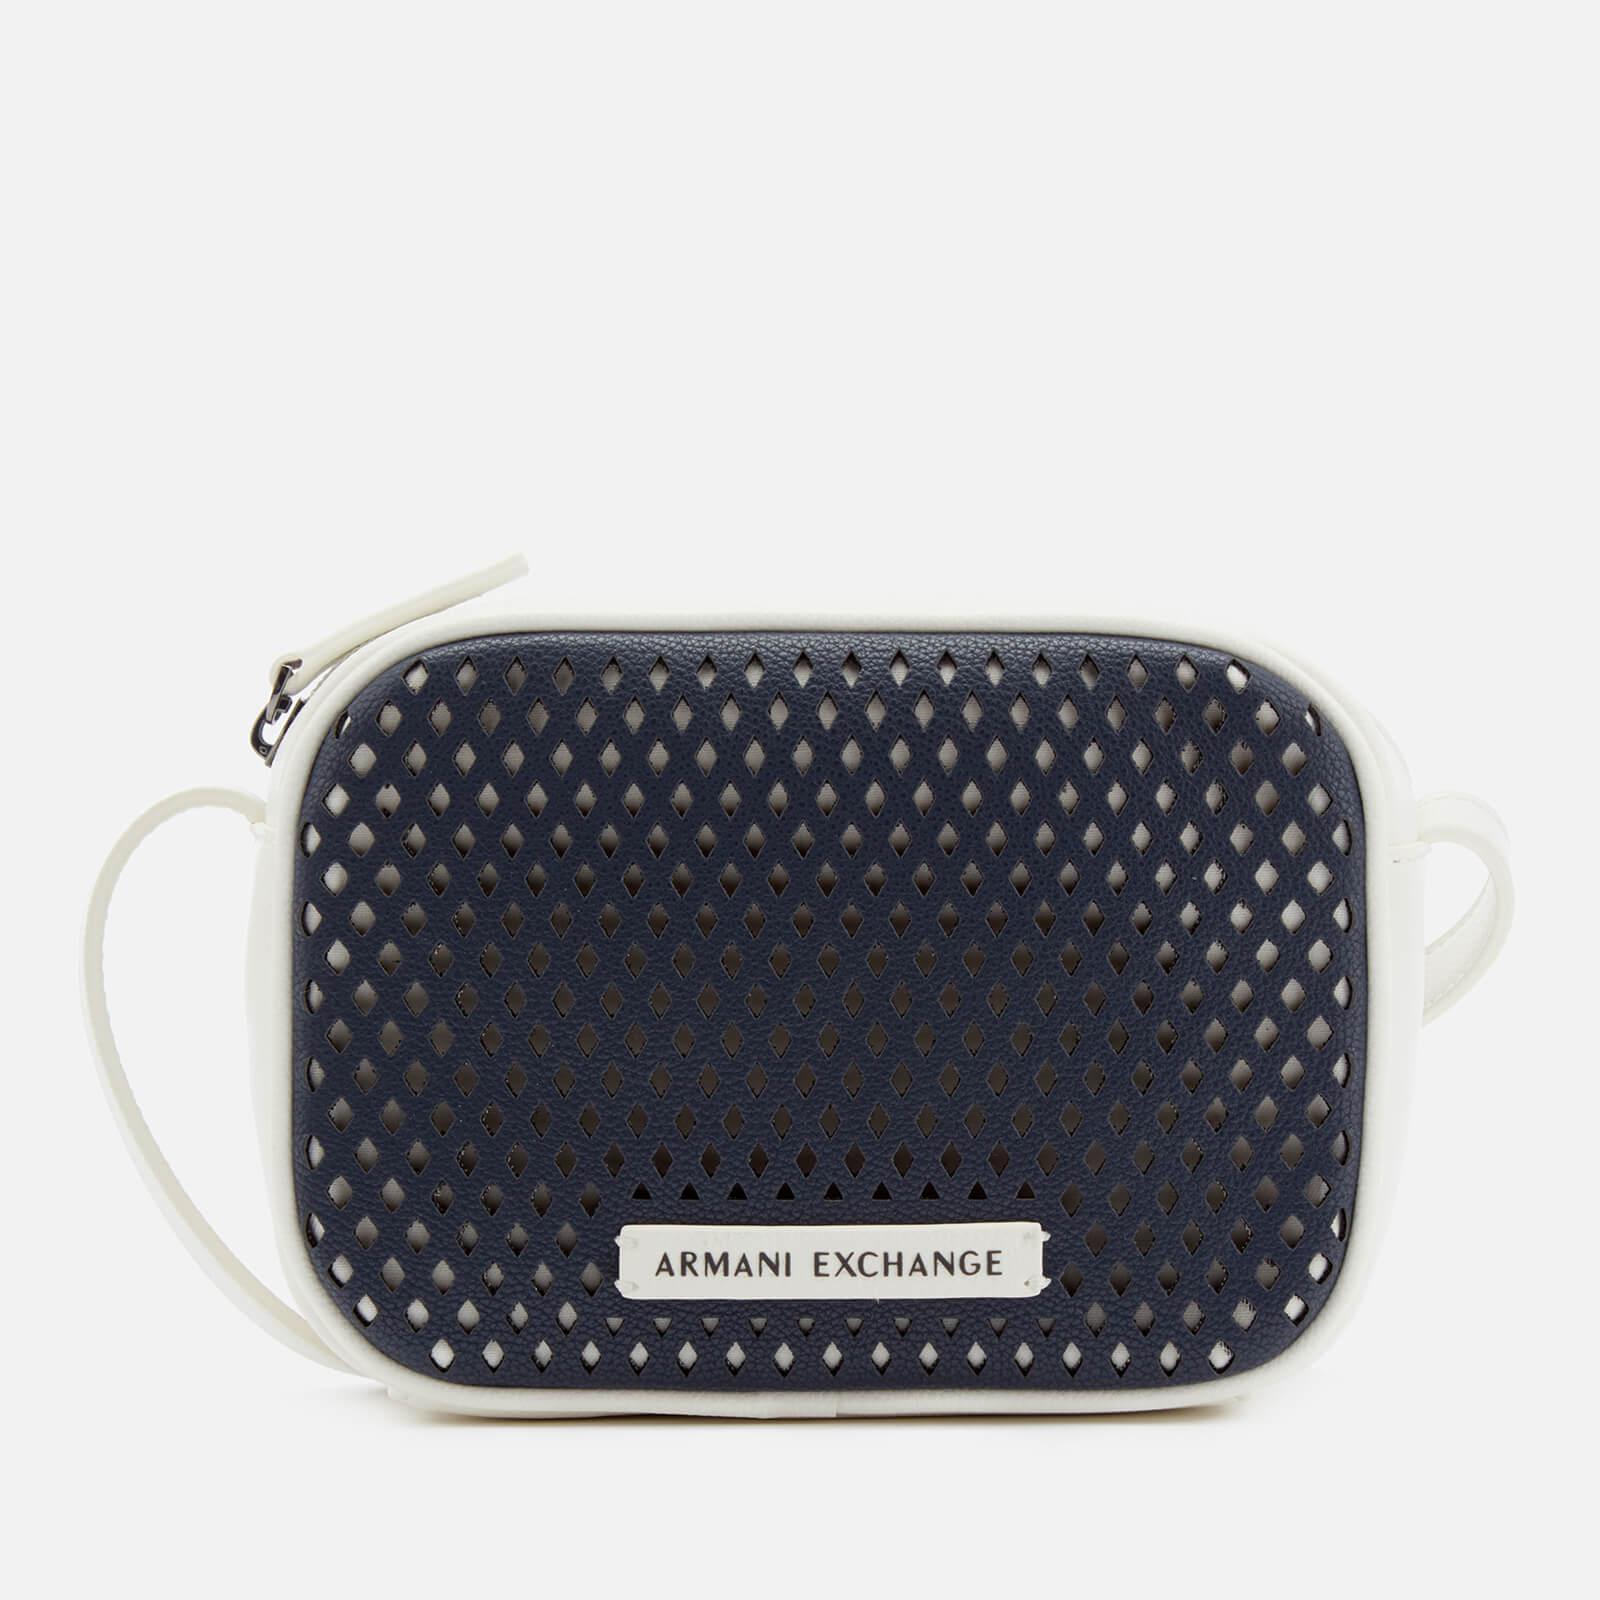 6ee2bd796b24 Armani Exchange - Blue Perforated Cross Body Bag - Lyst. View fullscreen